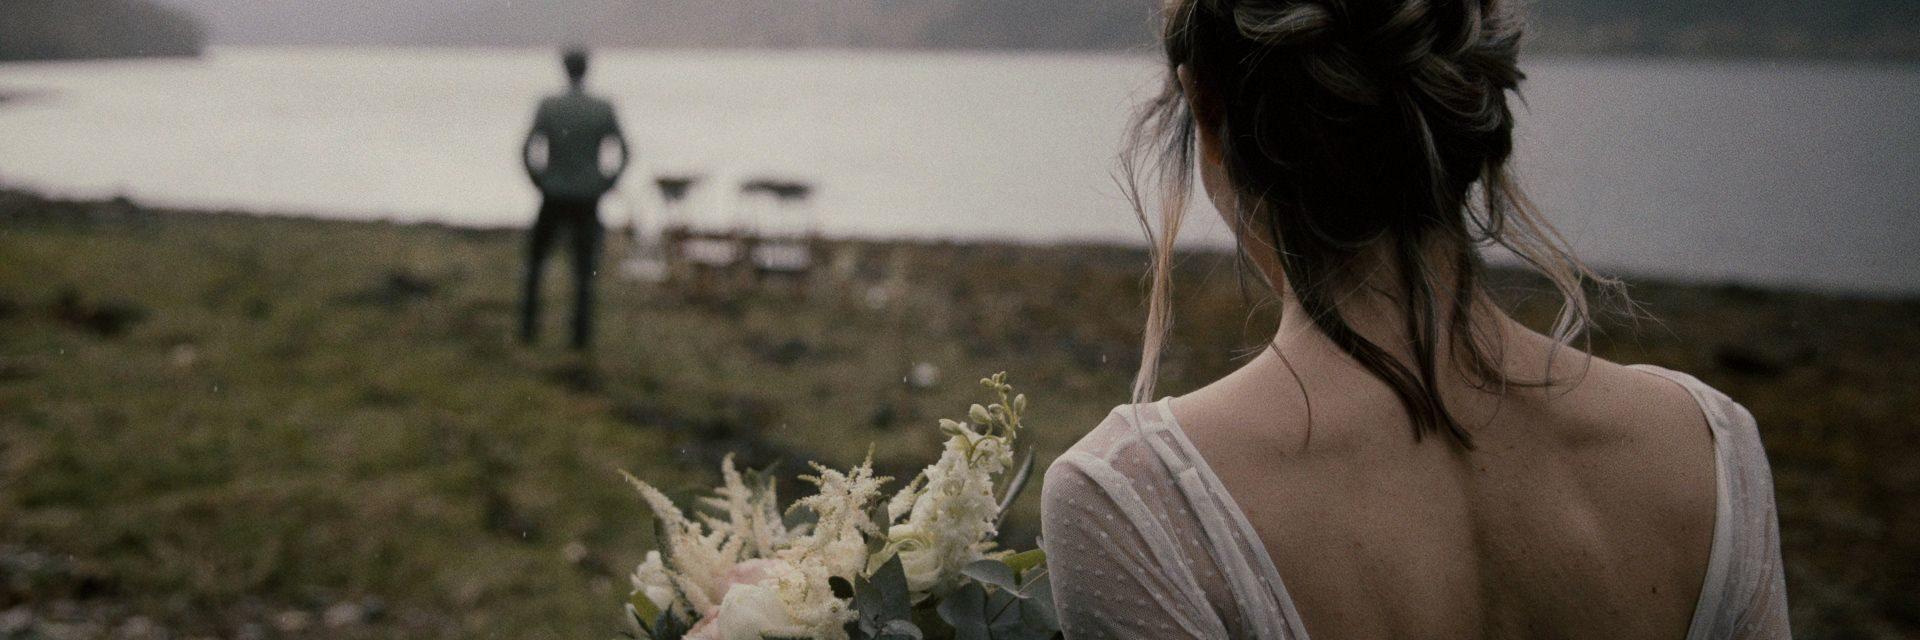 Fjadrargljufur Canyon-wedding-videographer-cinemate-films-02